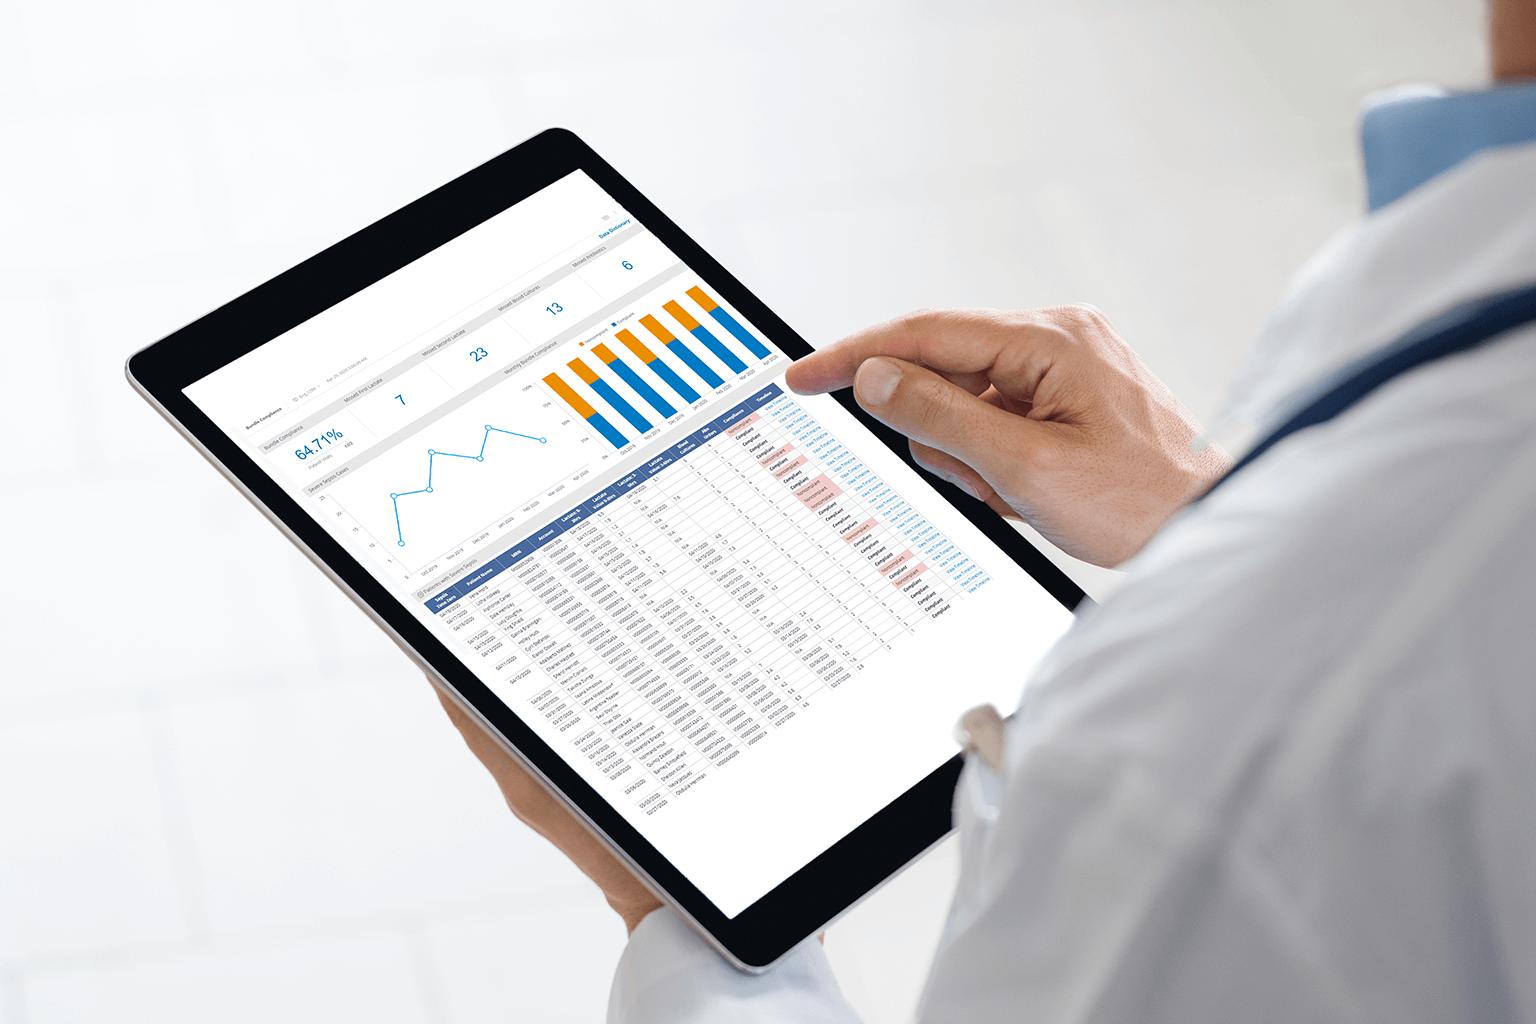 POC-Advisor-Bundle-Compliance-Analytics-on-Ipad